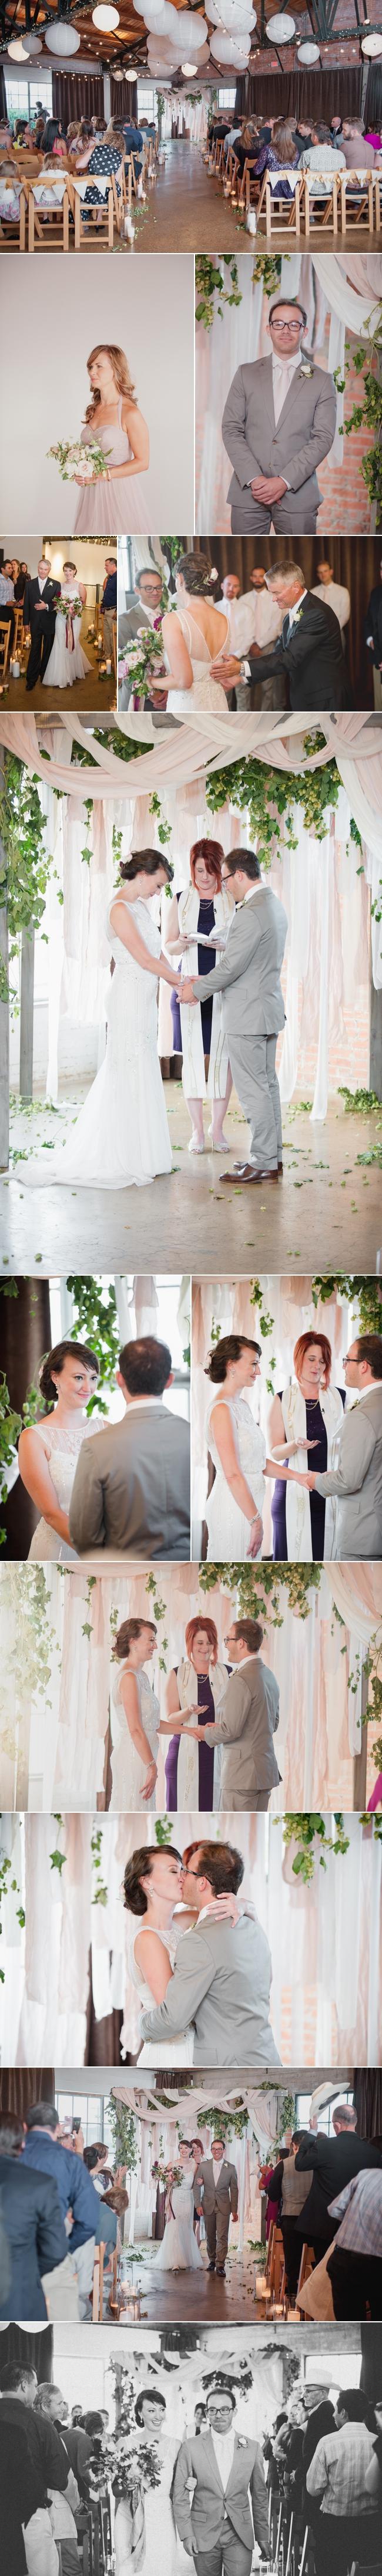 Hickory Street Annex Weddings